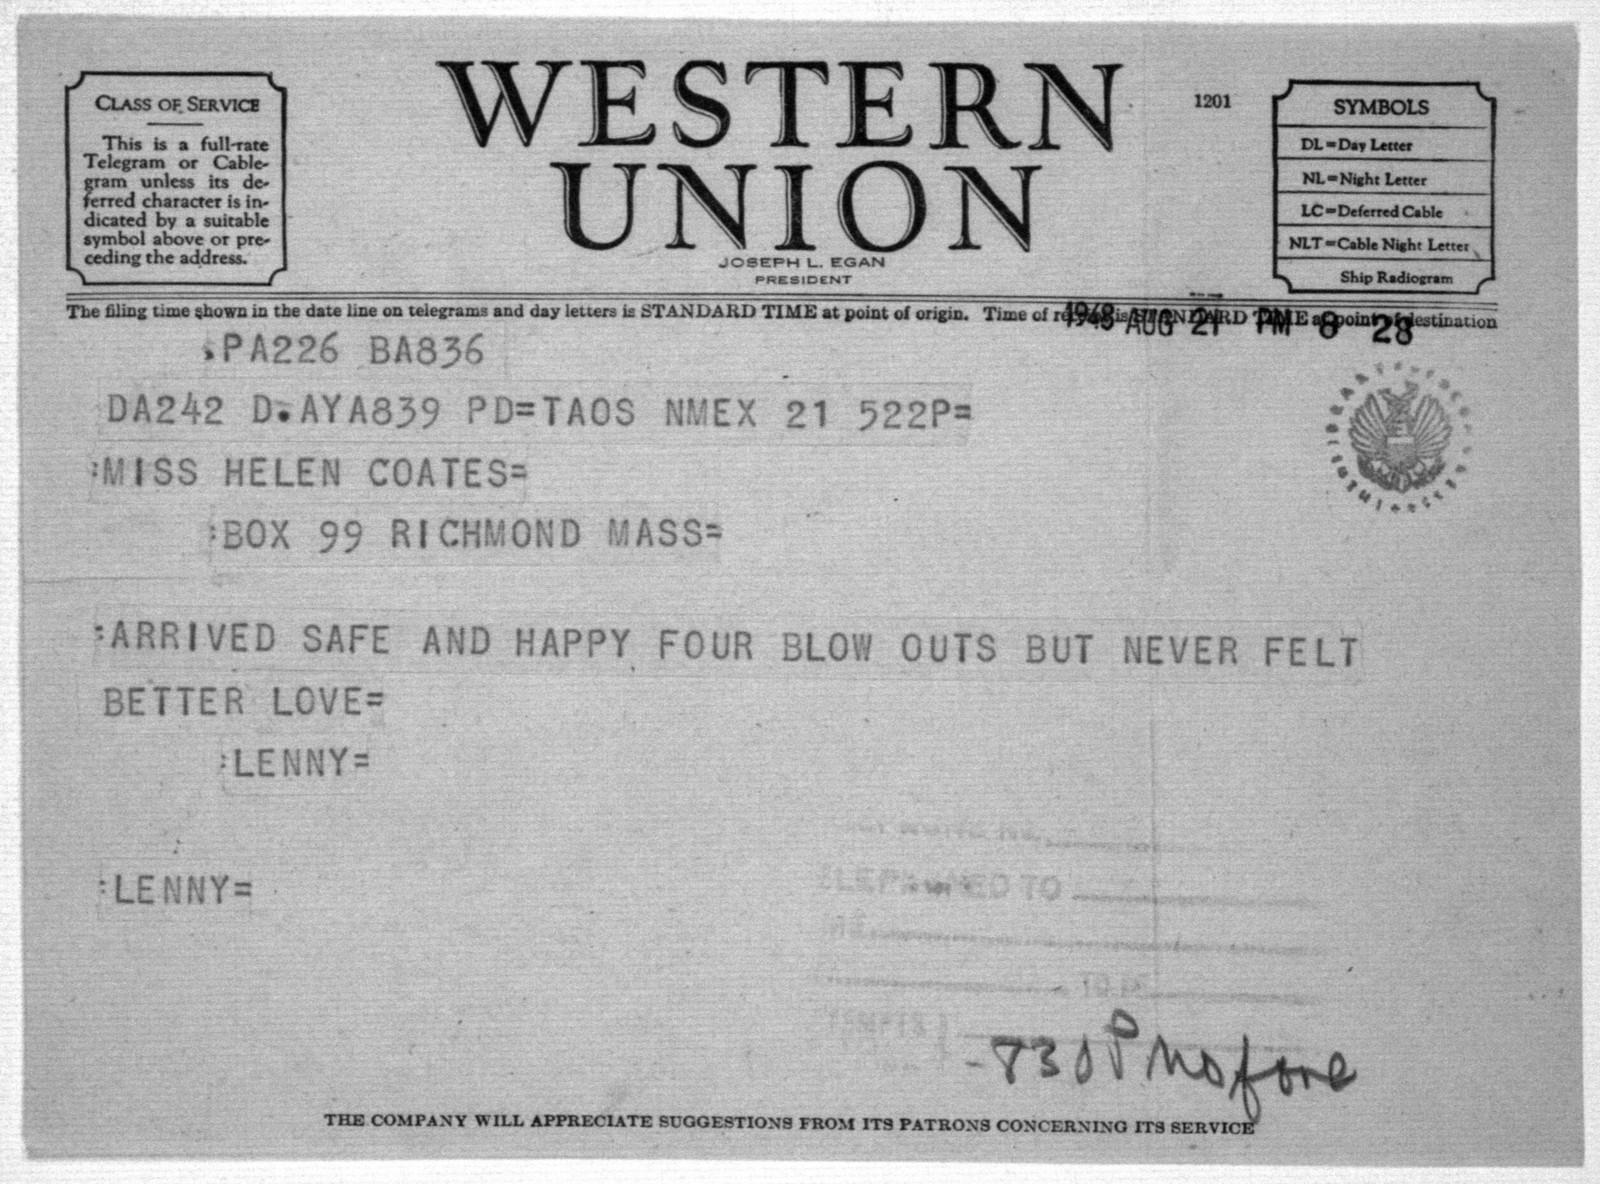 Letter from Leonard Bernstein to Helen Coates, August 21, 1948